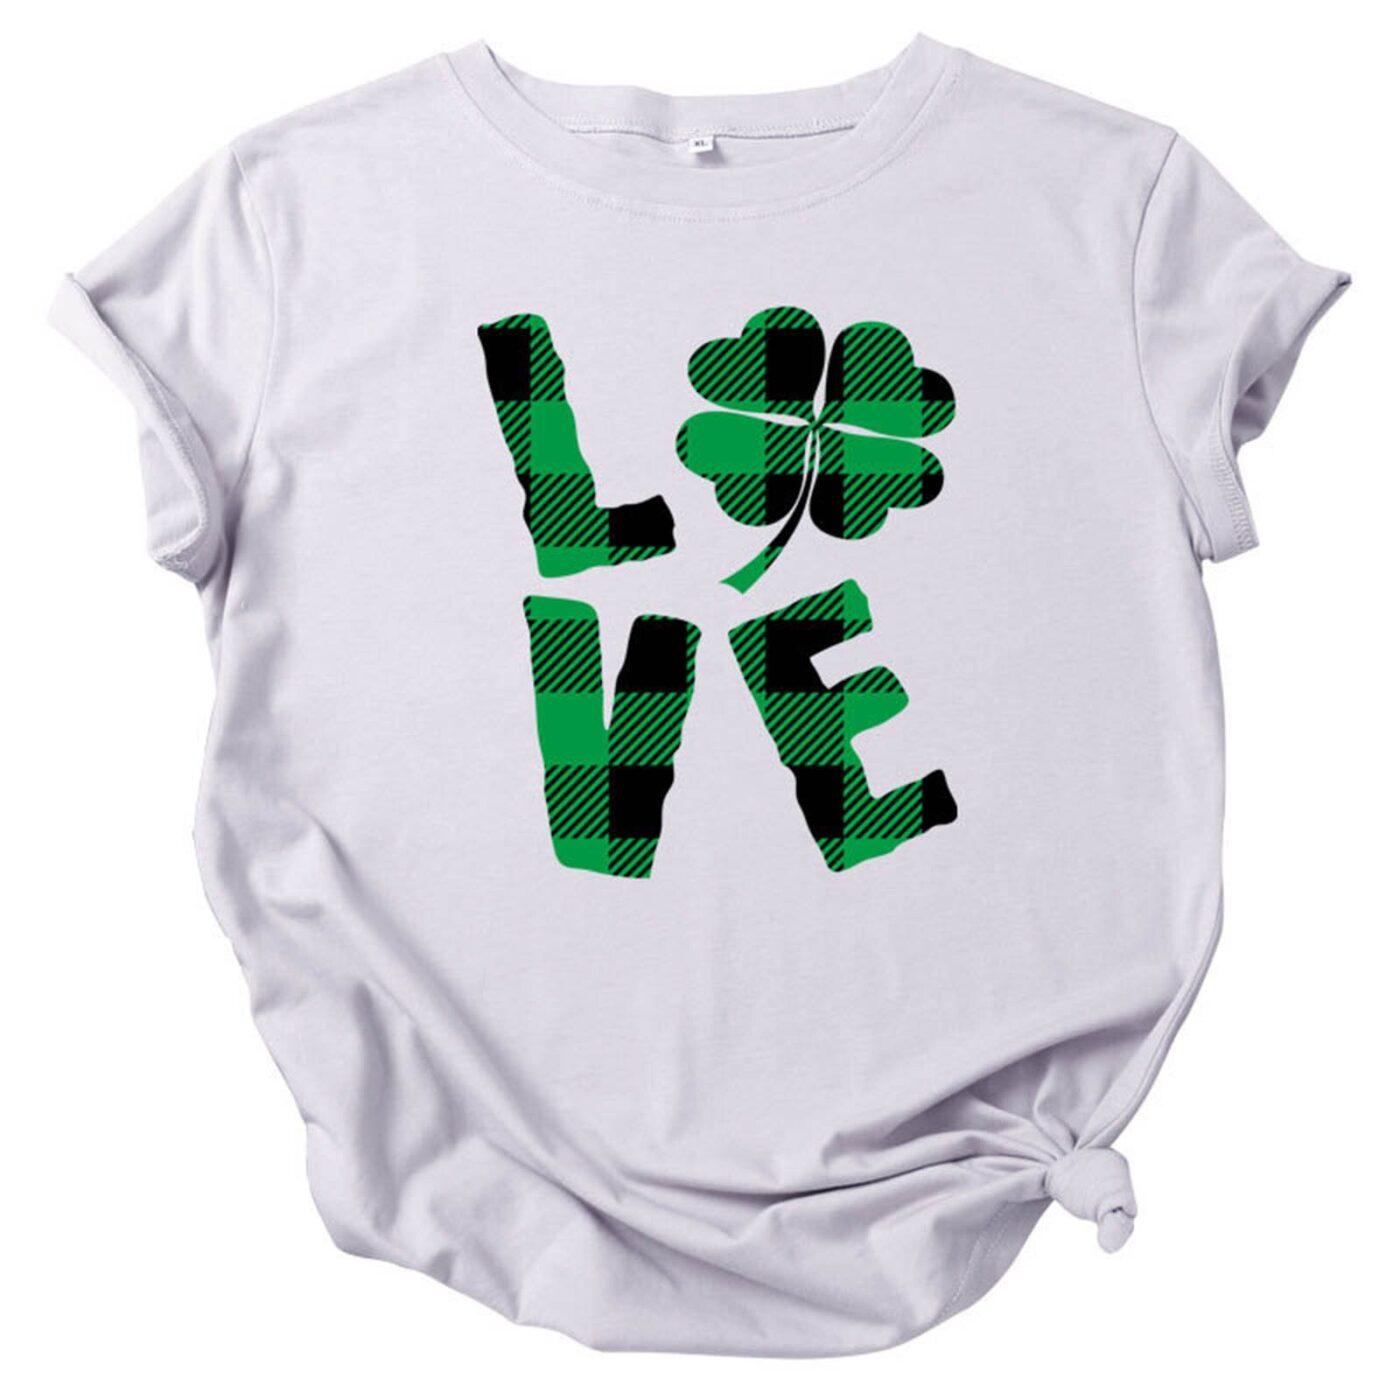 Love Letter Women's T-shirts